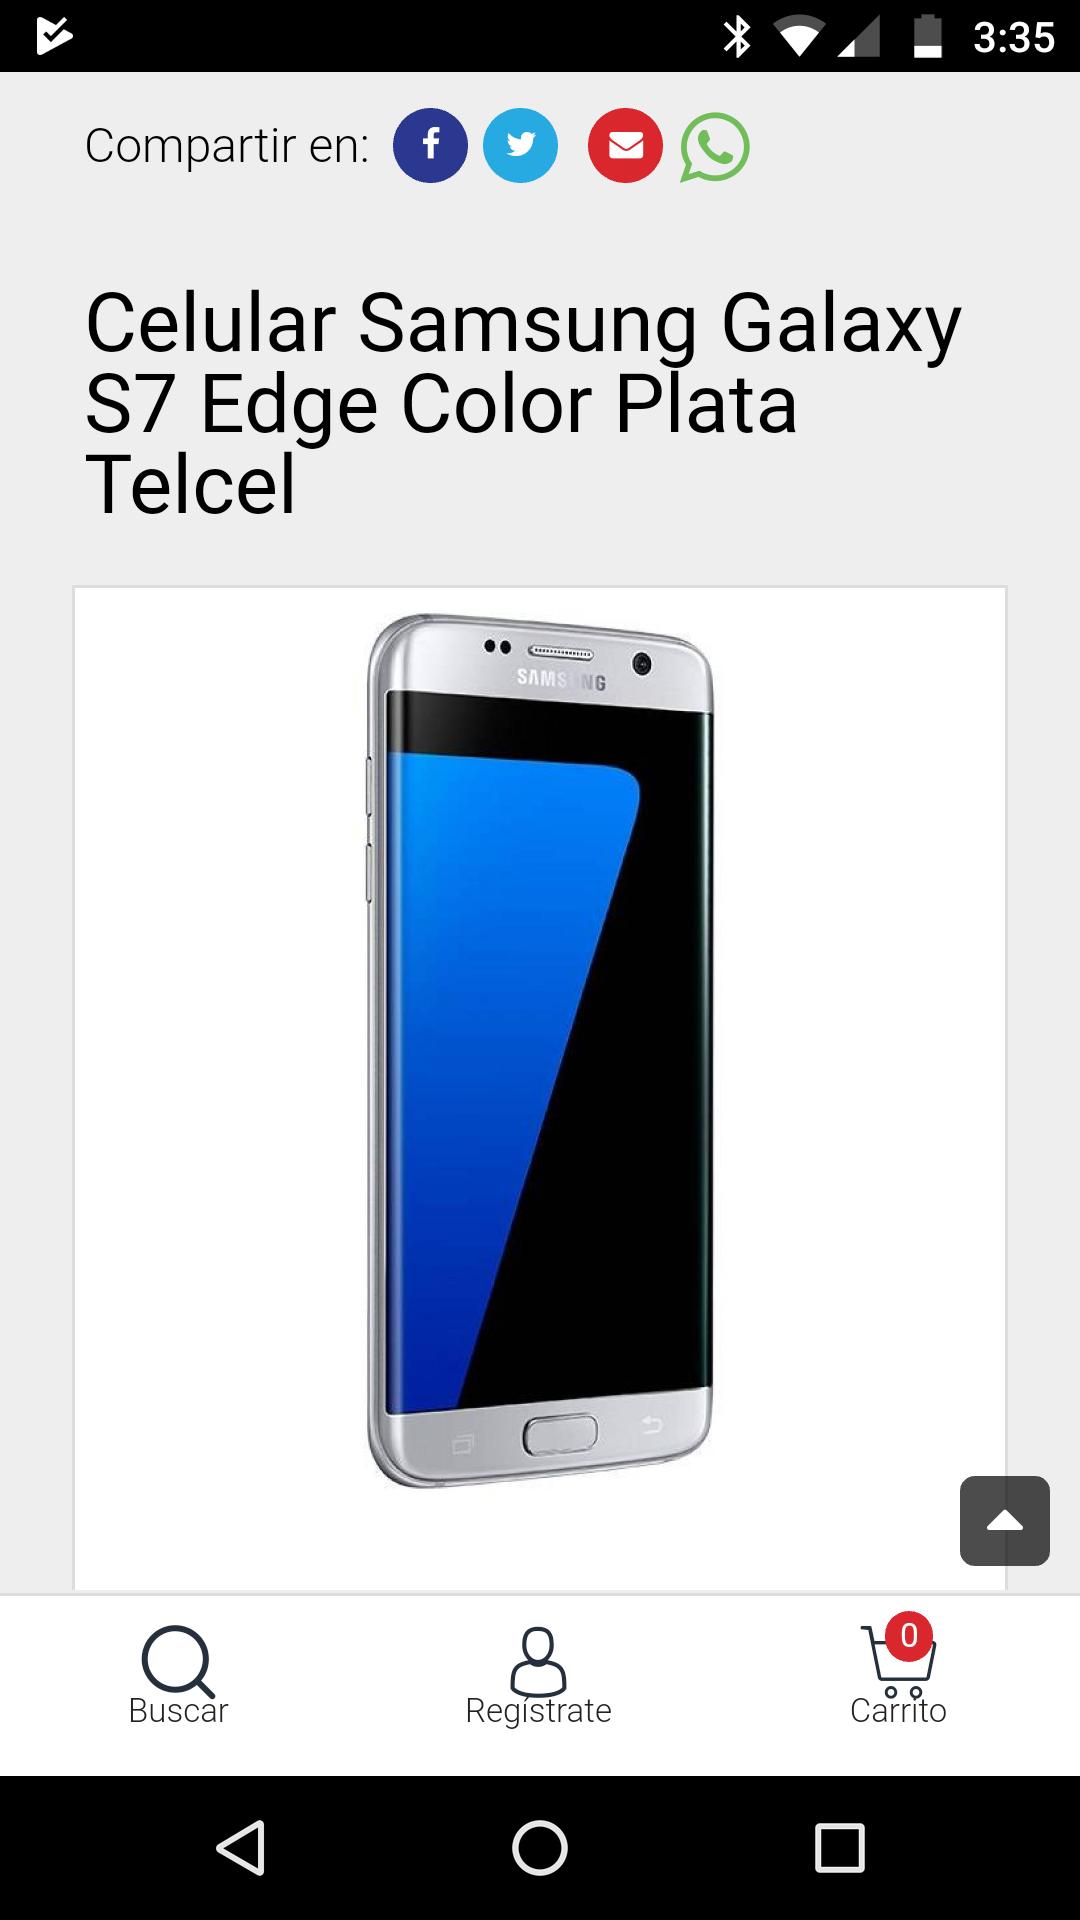 Claro Shop: Samsung Galaxy S7 Edge y Flat Telcel